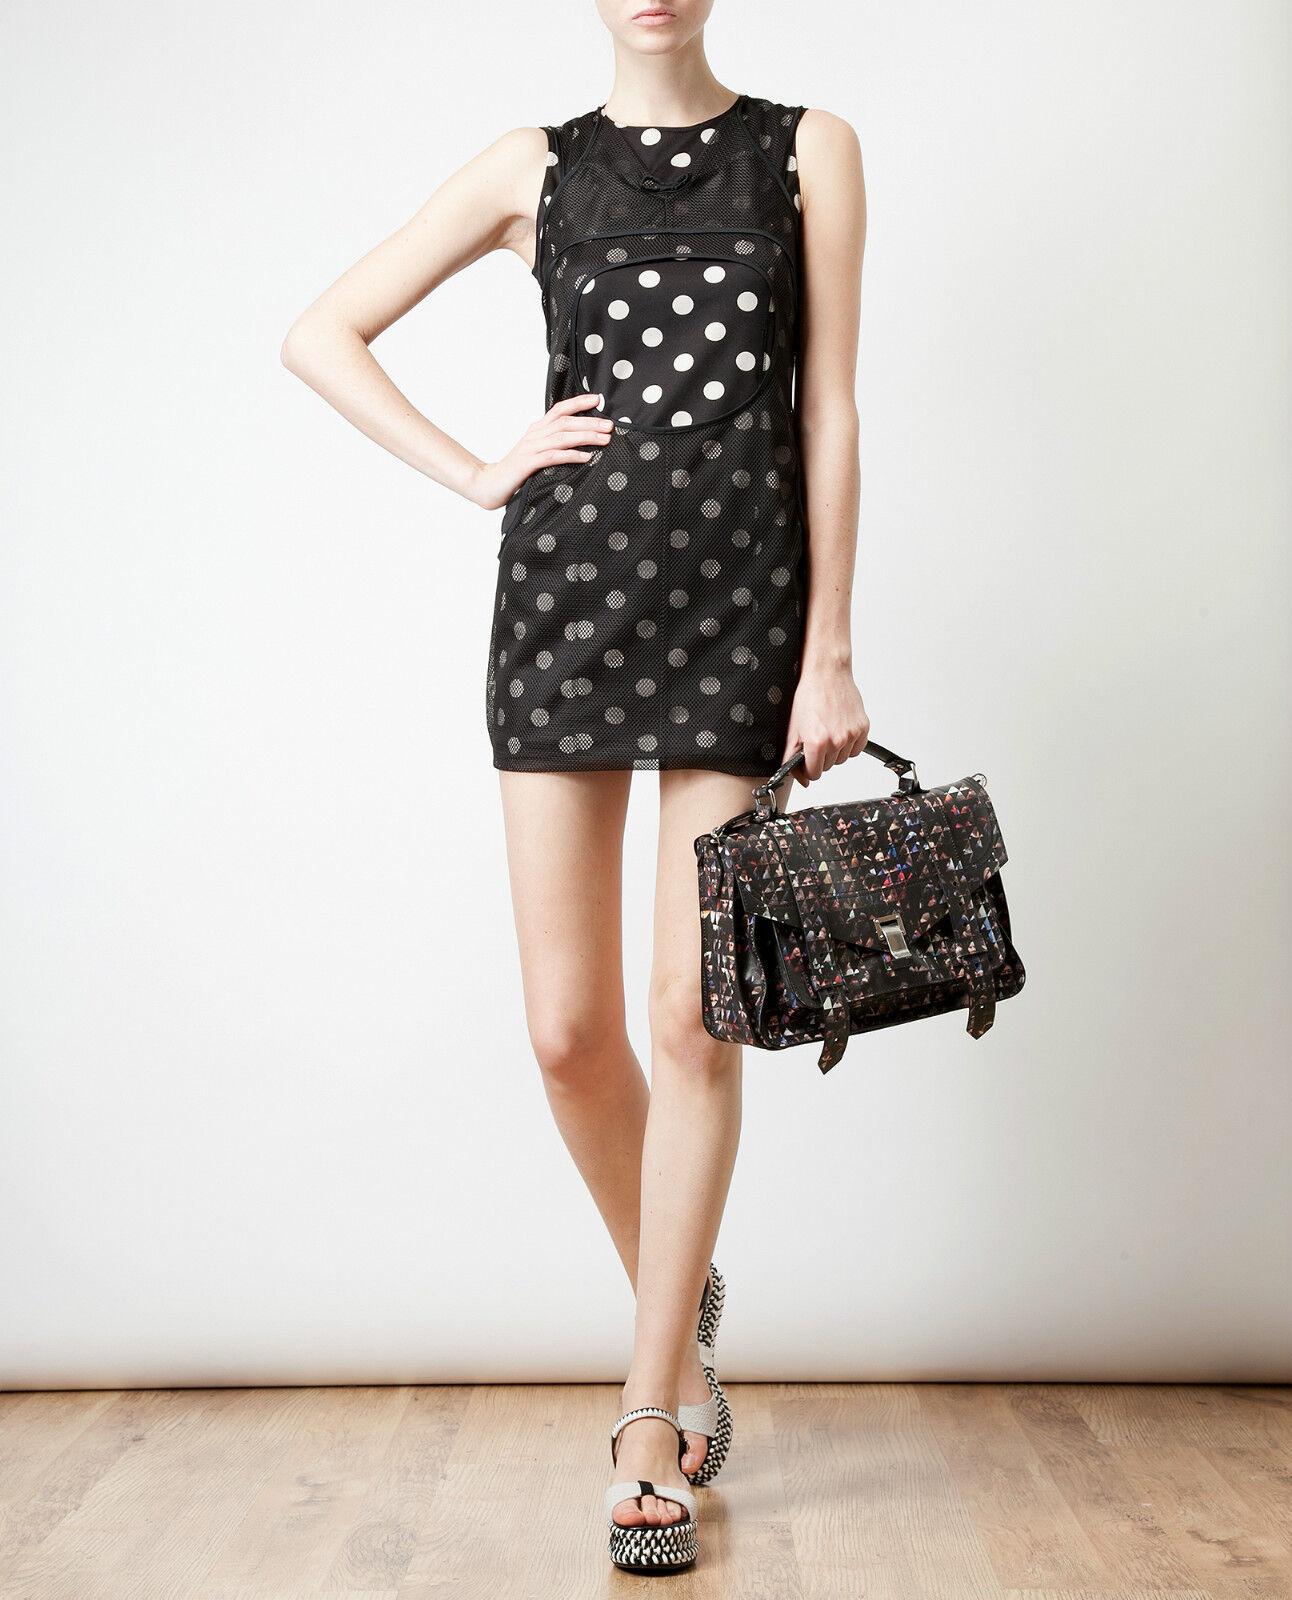 Junya Watanabe Mesh Overlay Polka Dot Mini dress ( Size L)